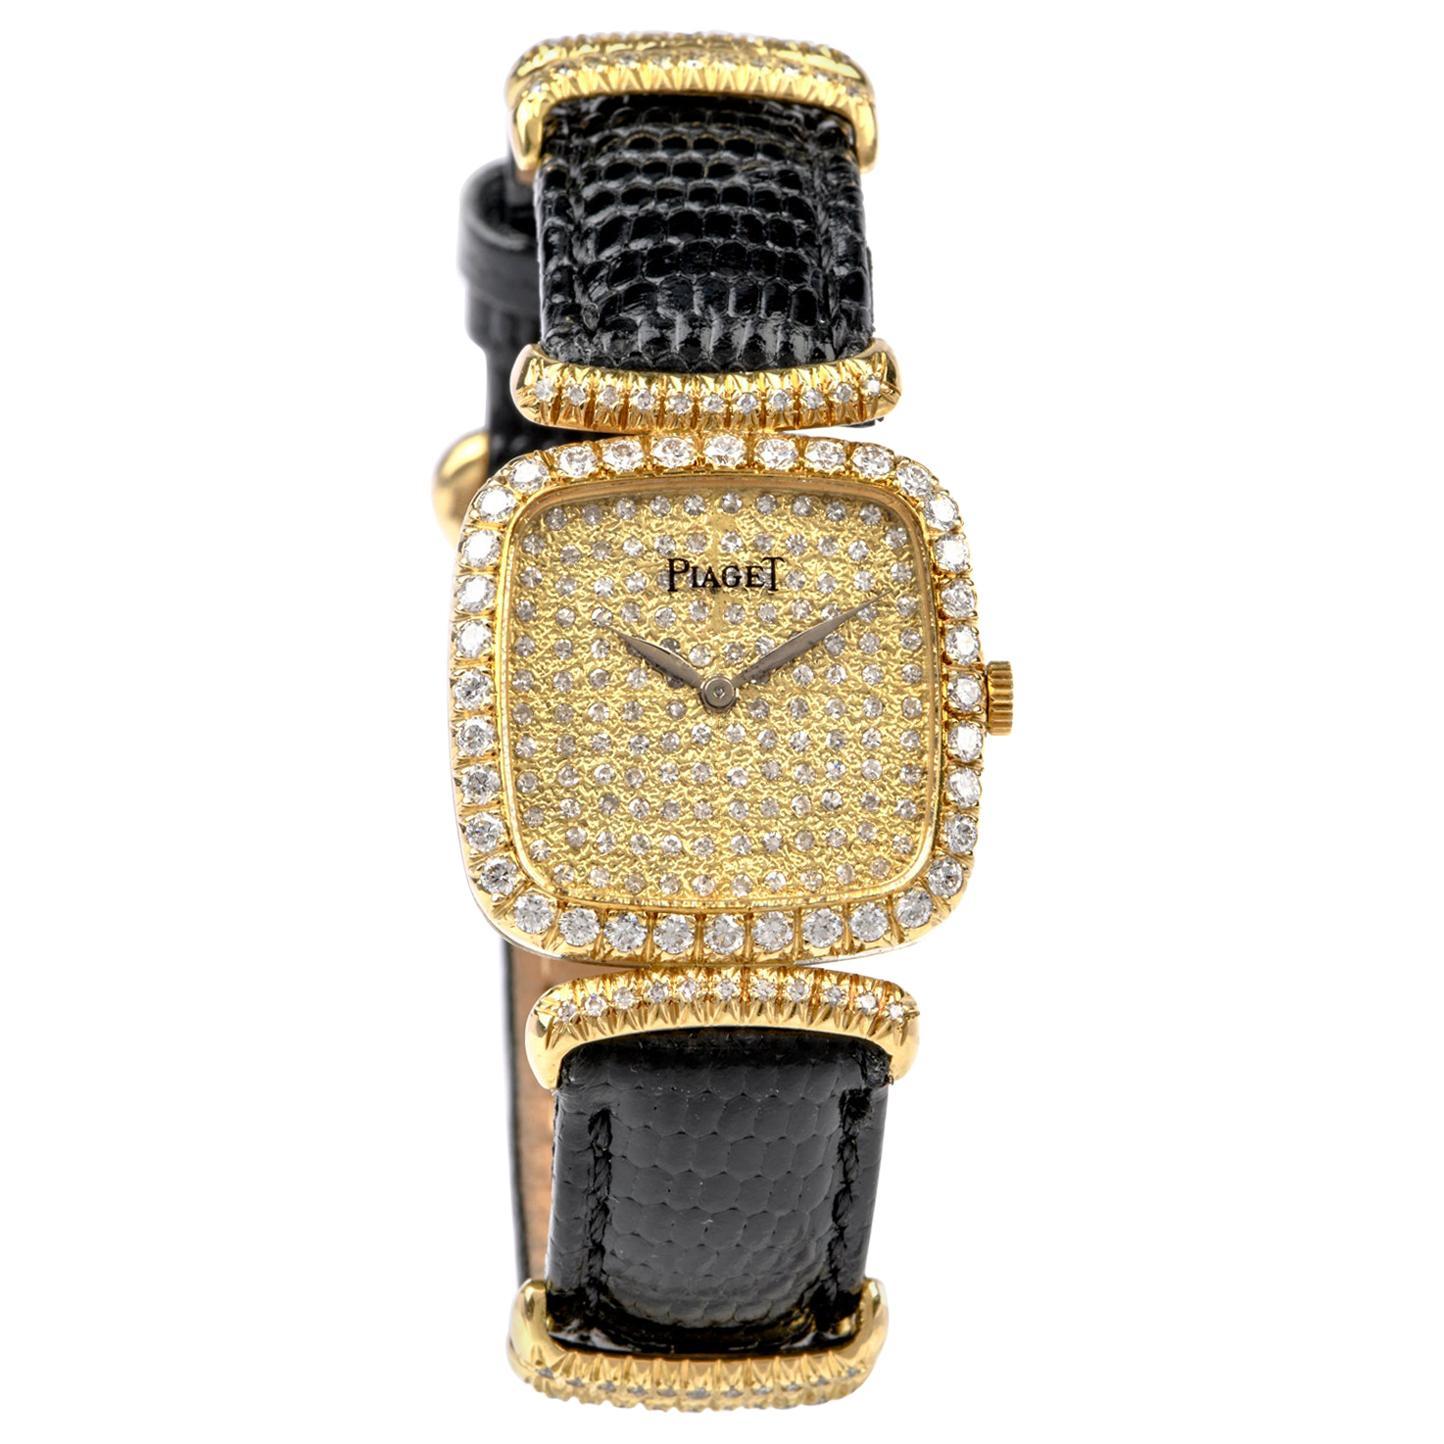 Piaget Vinatge Ladies Diamond Dial Bezel and Stapp Watch